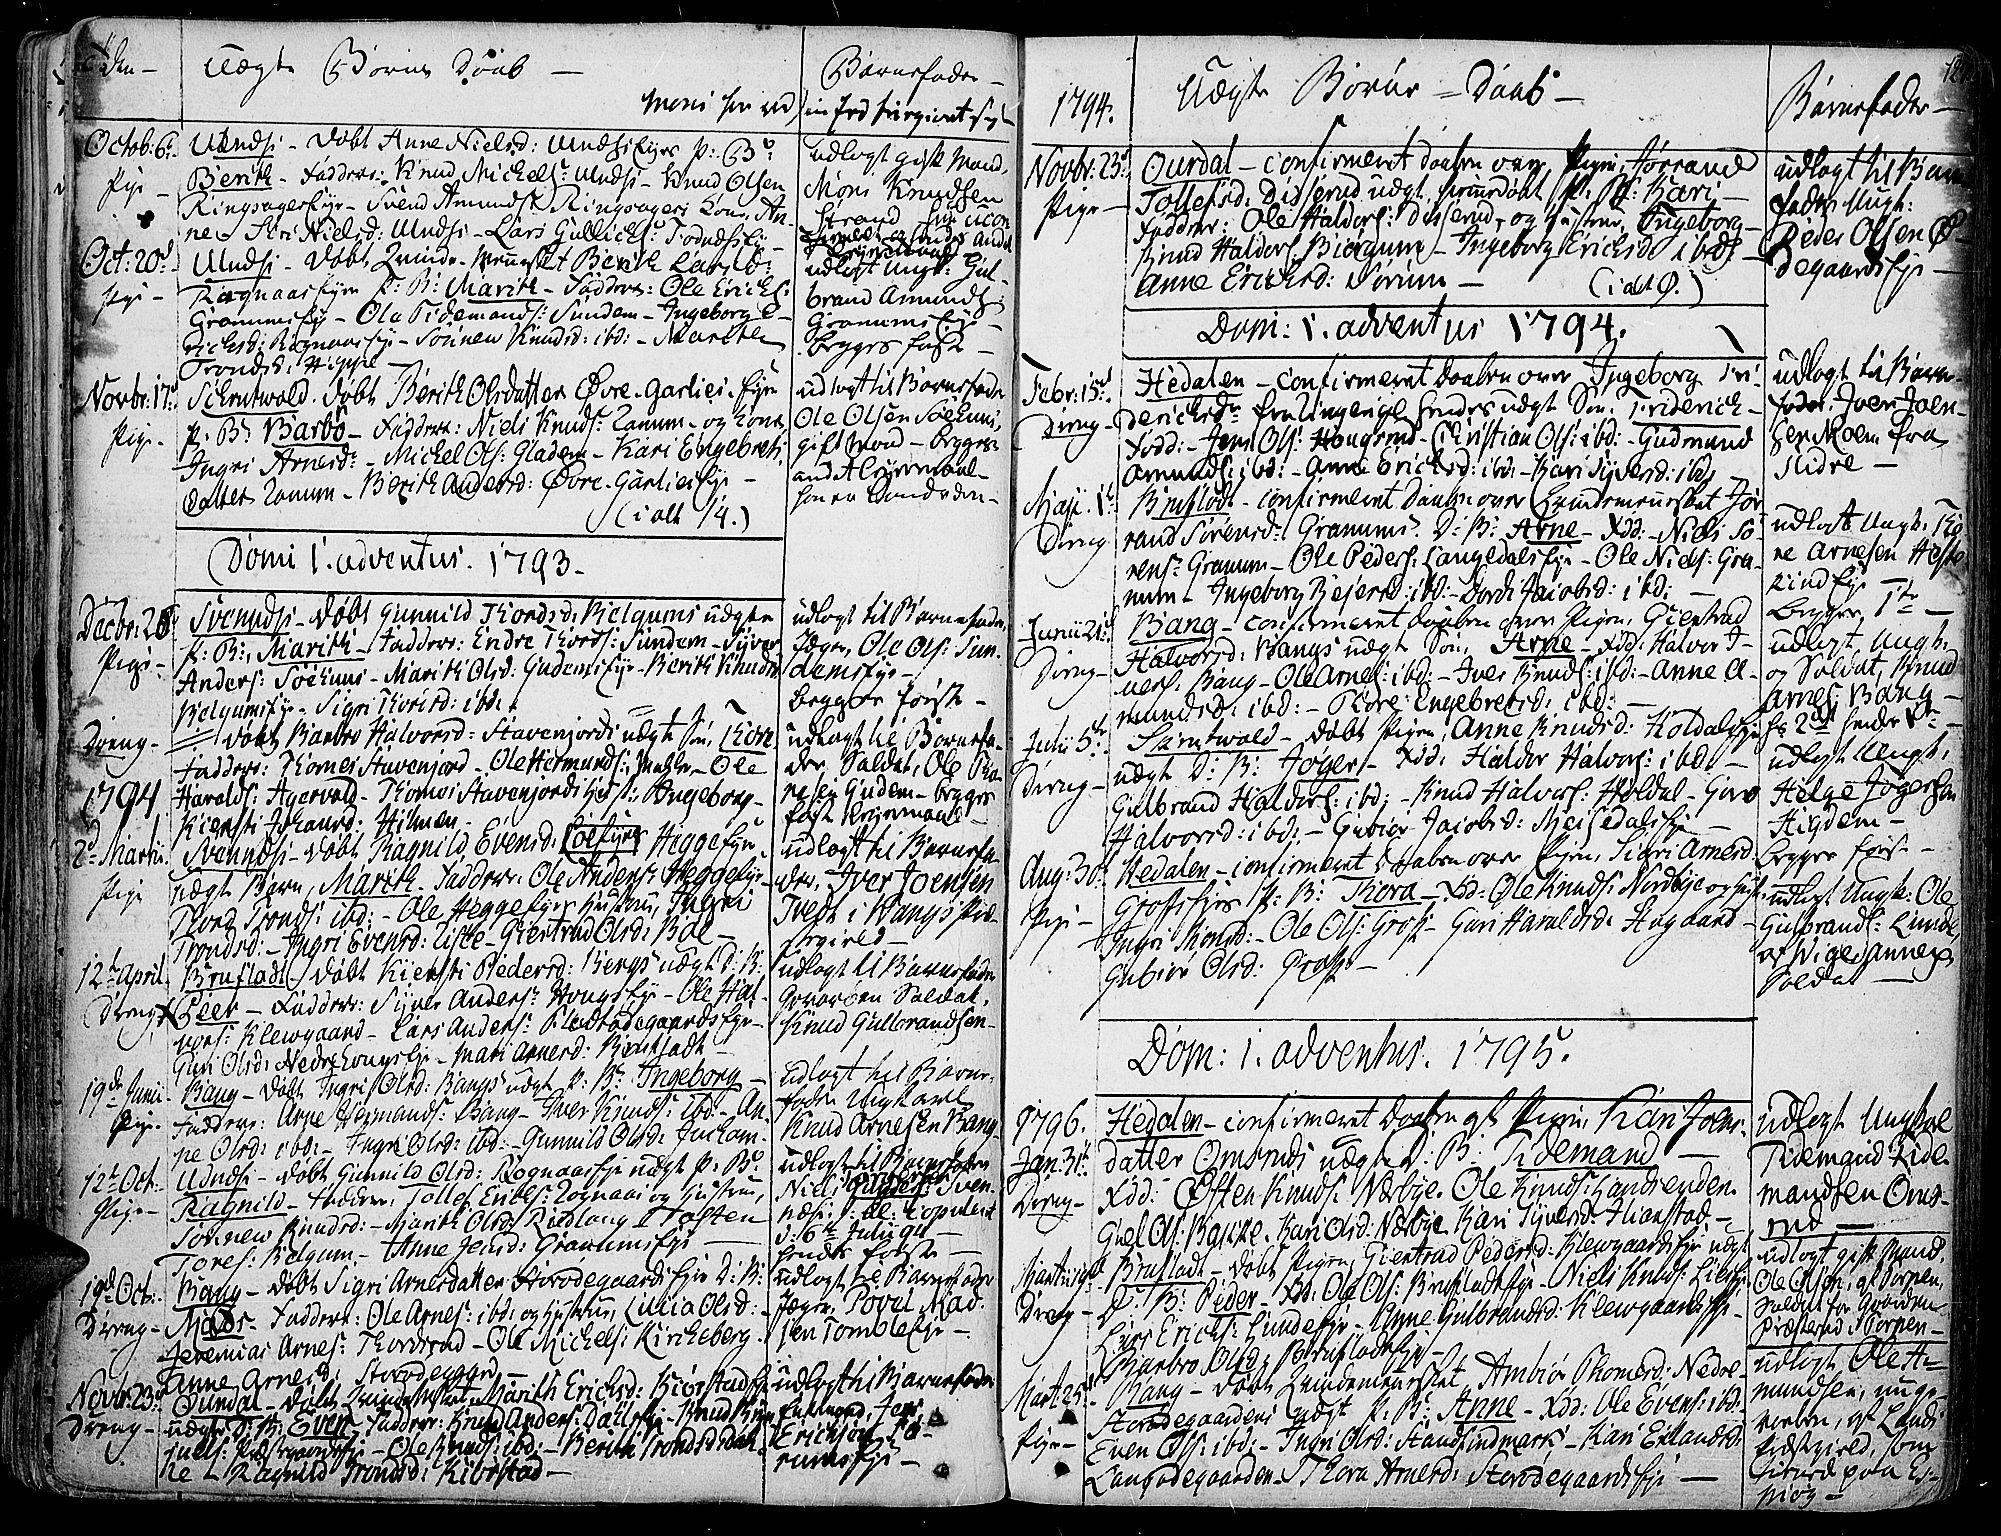 SAH, Aurdal prestekontor, Ministerialbok nr. 6, 1781-1804, s. 127